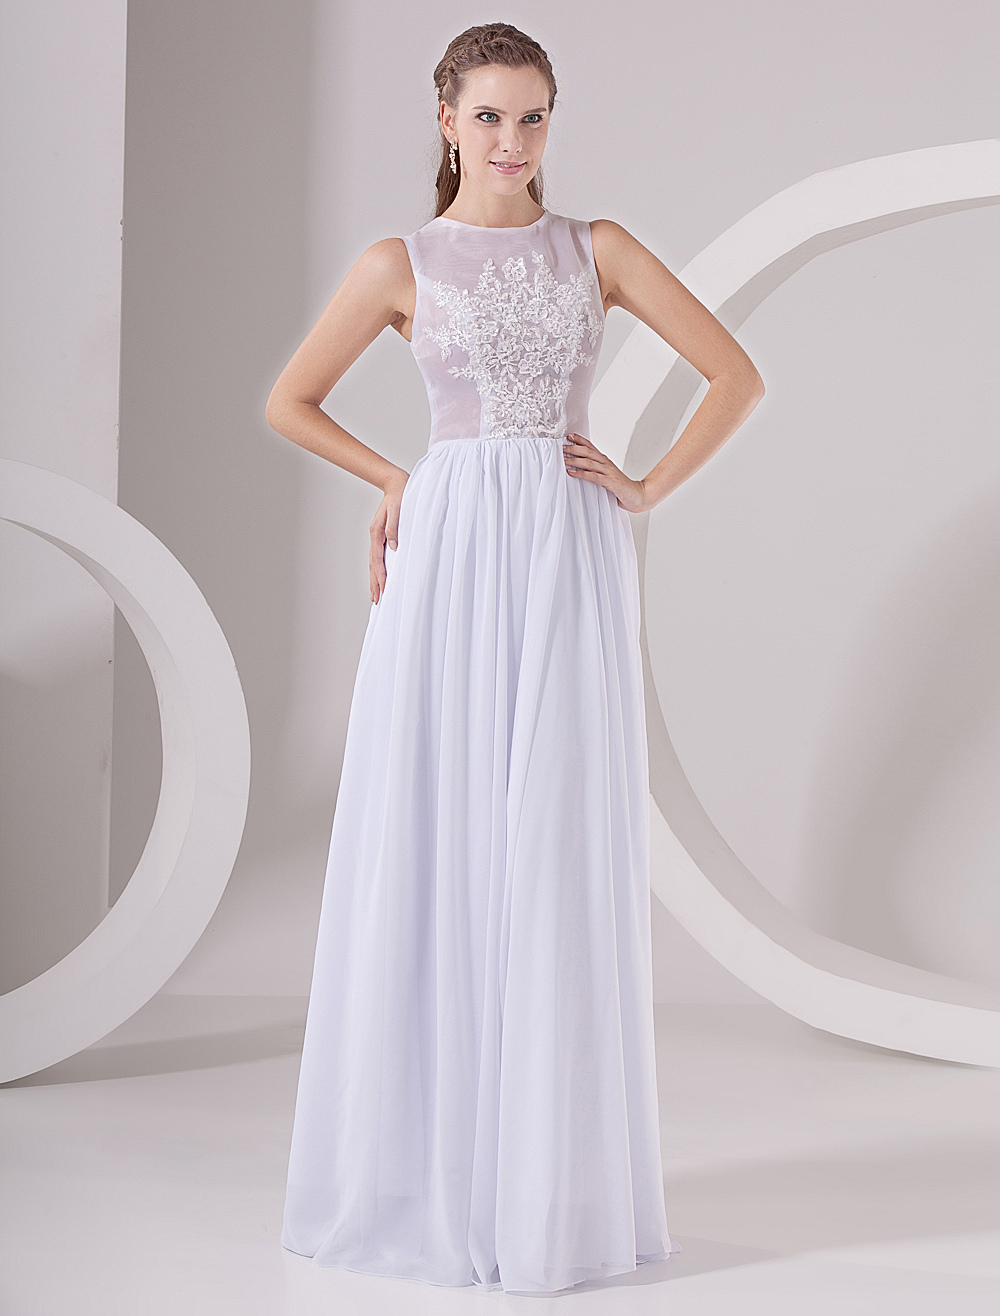 White Chiffon Ladies Special Occasion Dress (Wedding Evening Dresses) photo